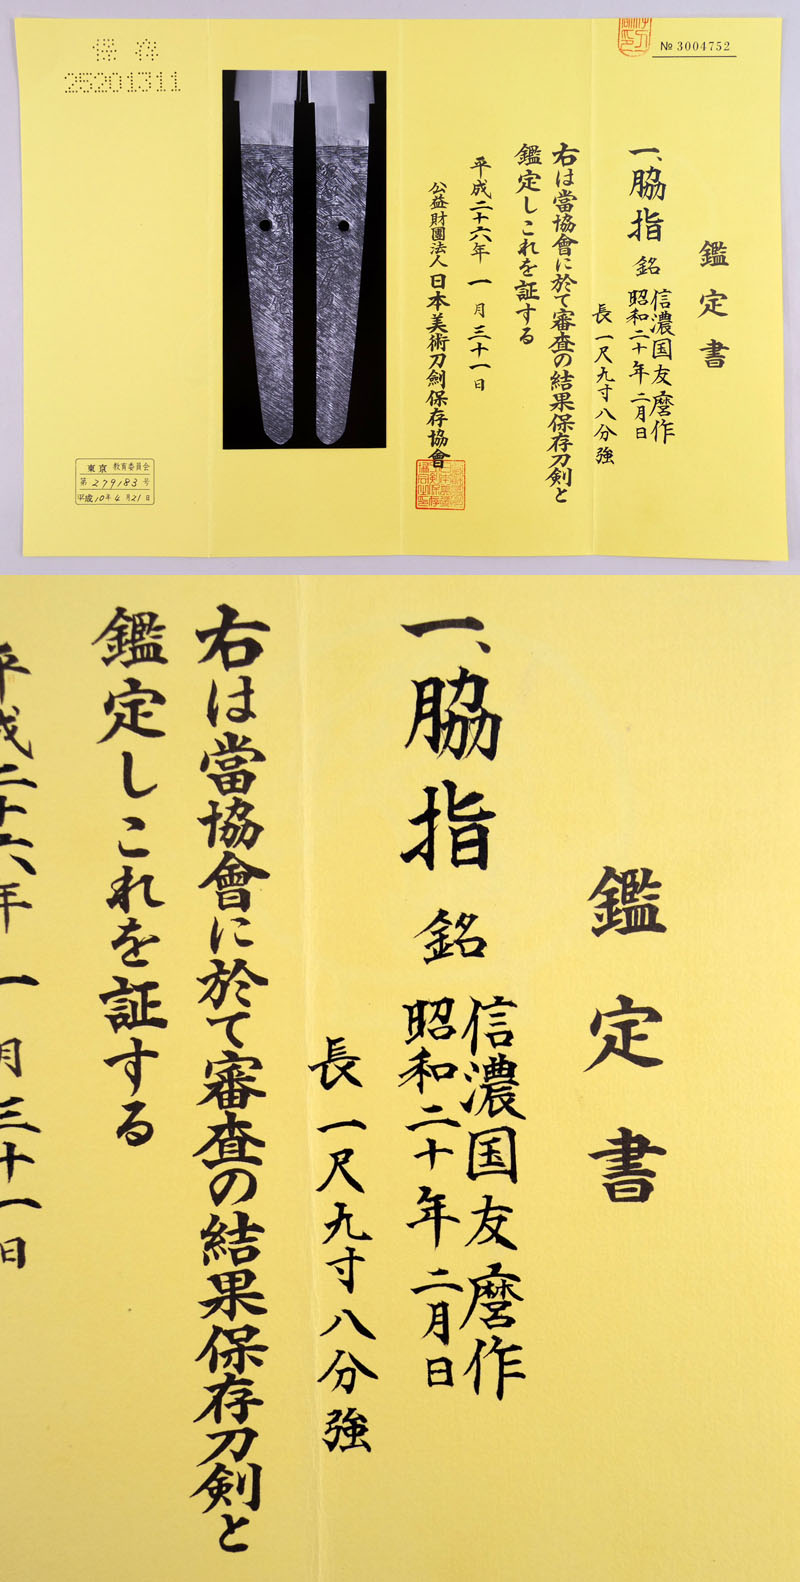 信濃国友磨作 Picture of Certificate